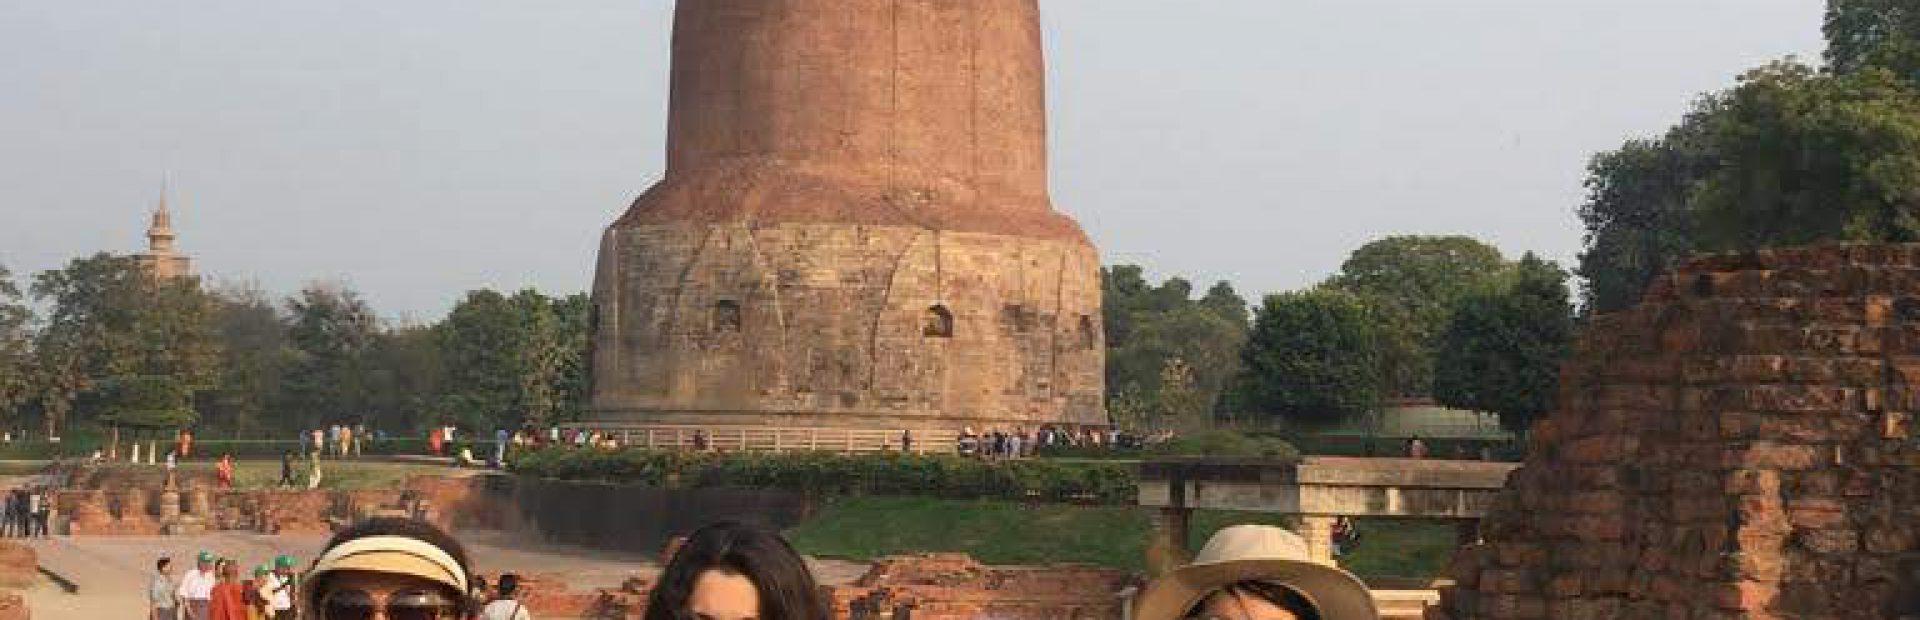 Ölüm Şehri Varanasi